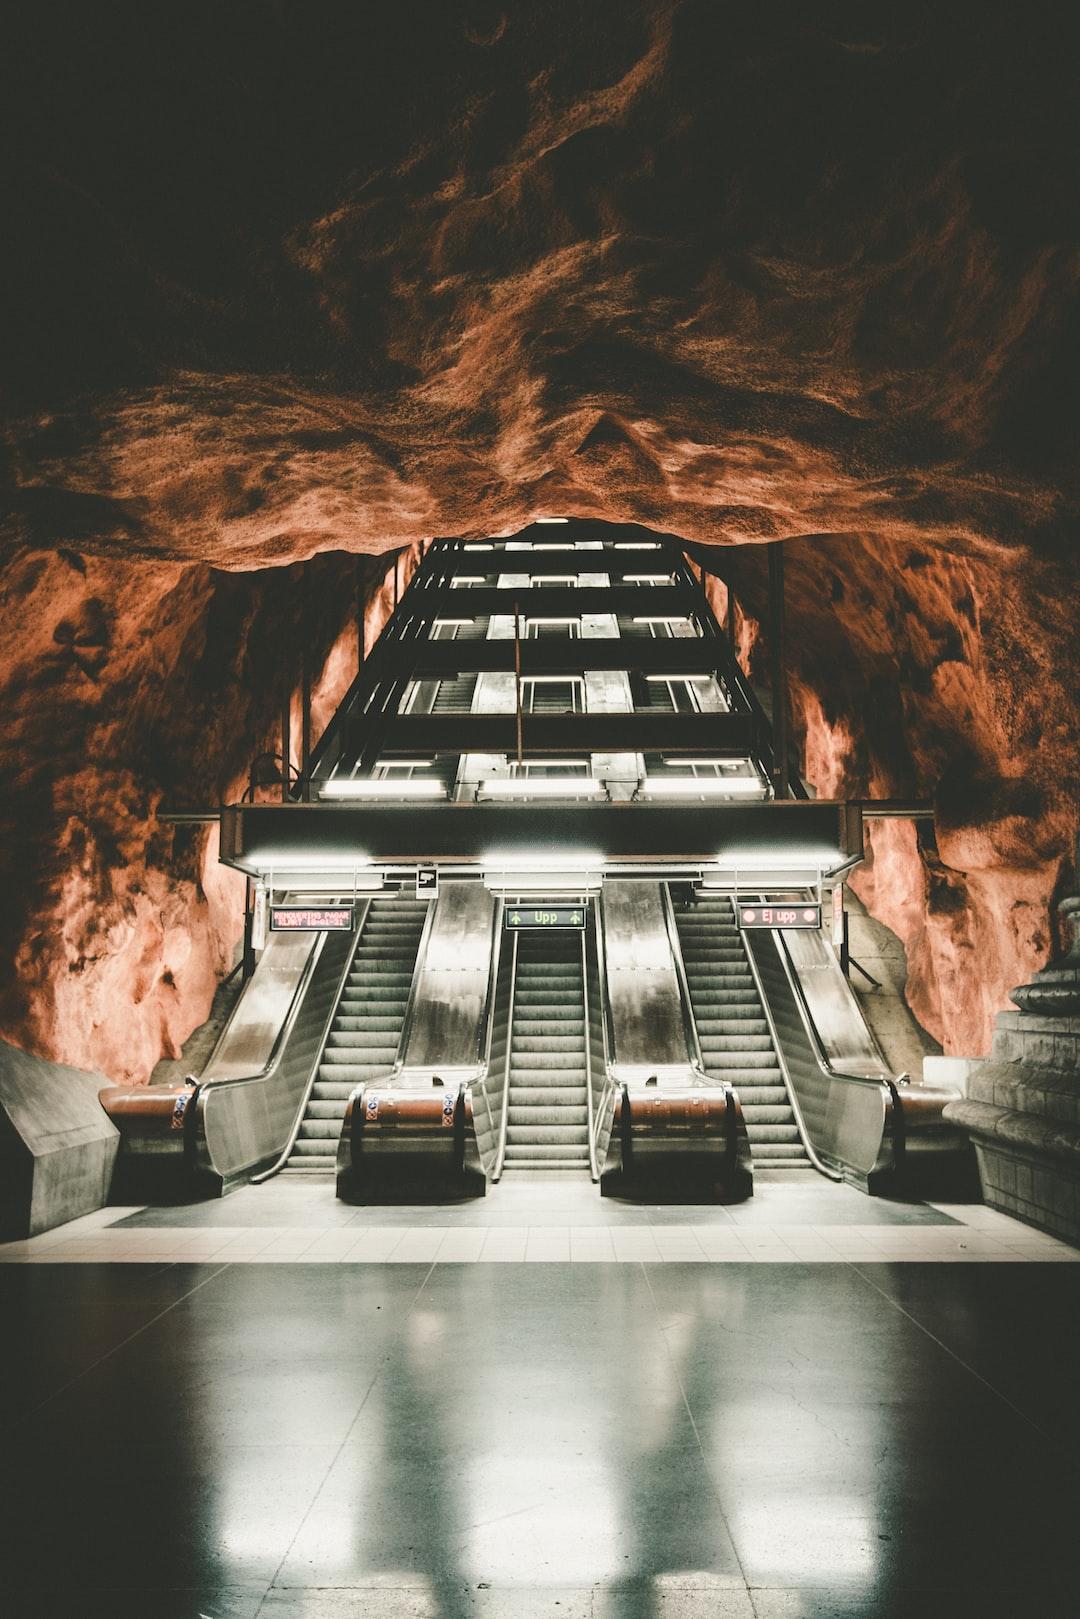 Stockholm Underground Station